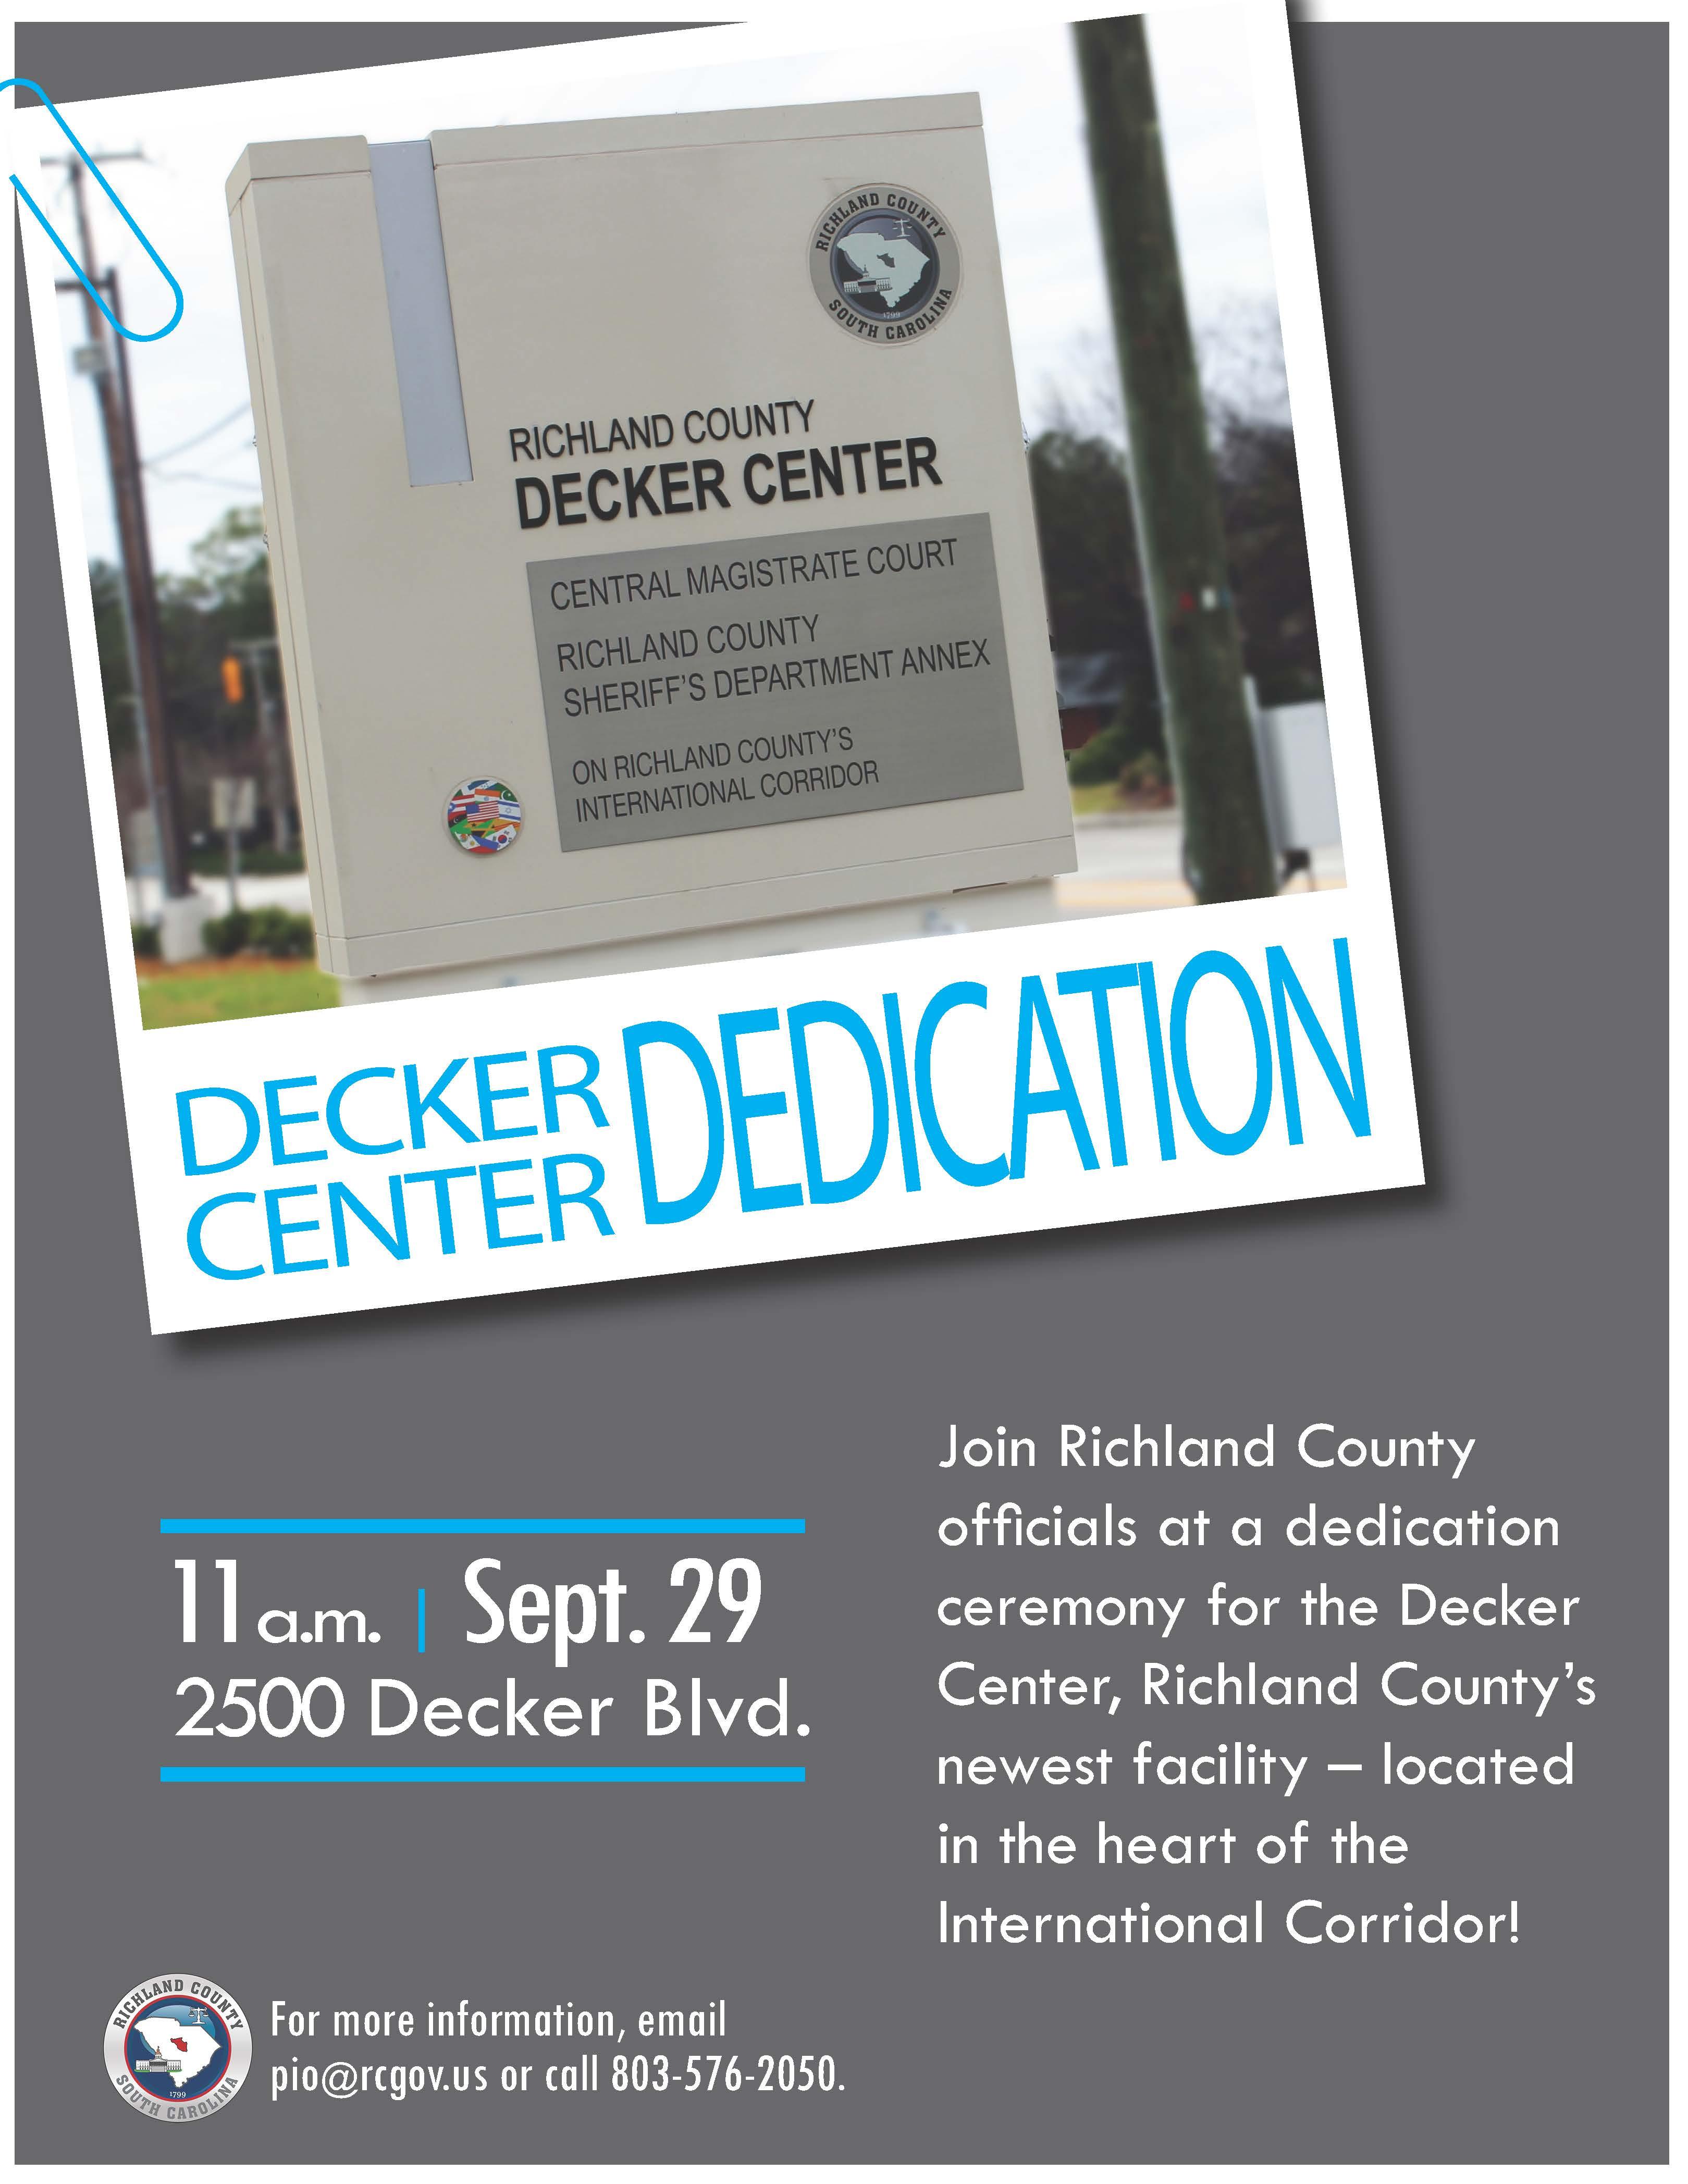 Decker Center Dedication Ceremony For Richland County Family Court Calendar